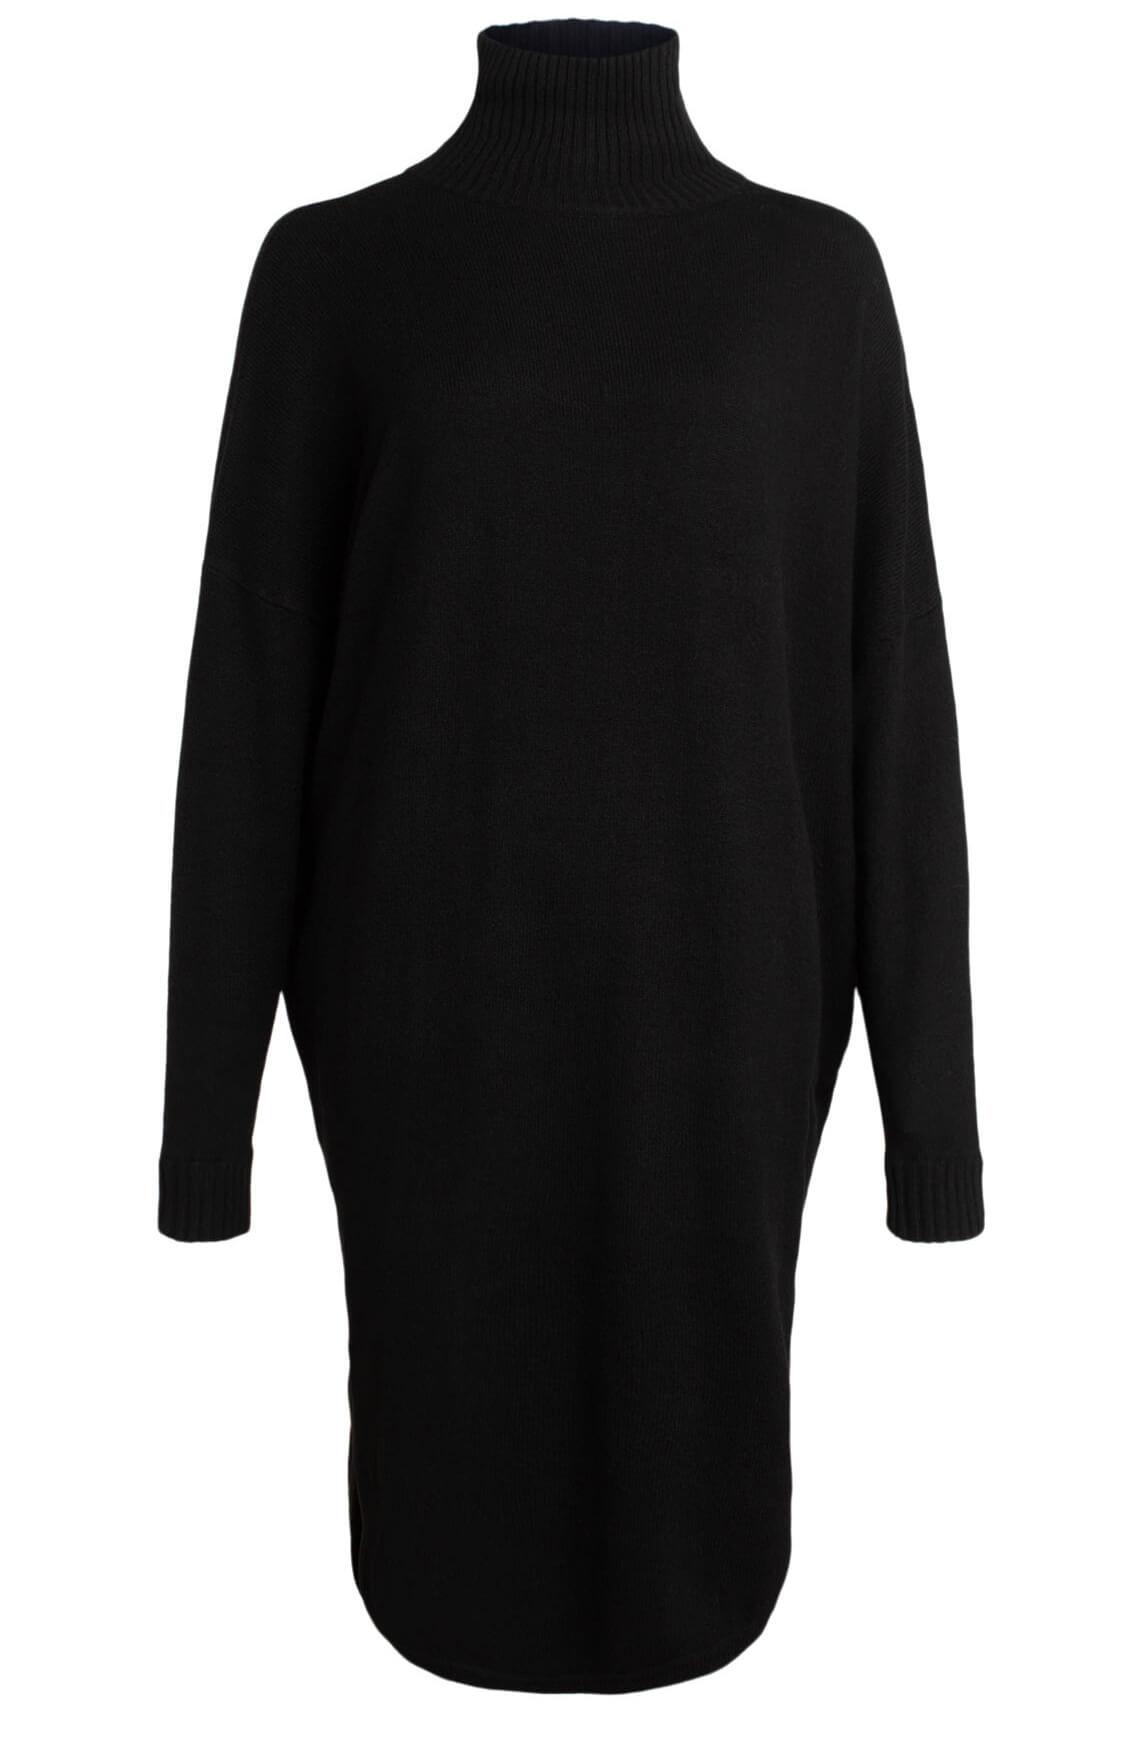 10 Days Dames Gebreide jurk met col zwart